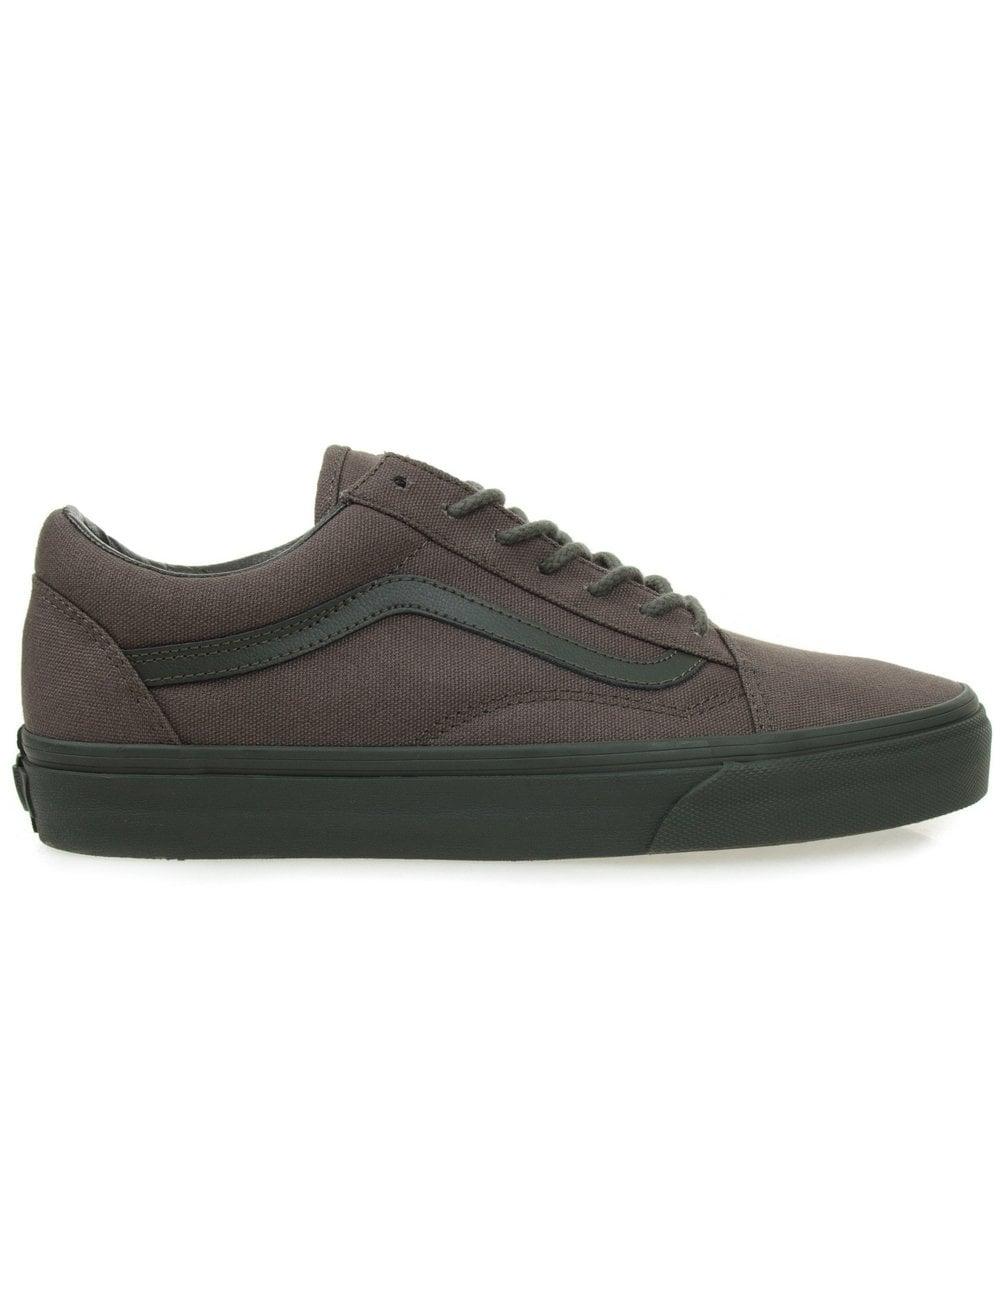 Vans California Old Skool Reissue - Forest Green - Footwear from Fat ... fb88518ace